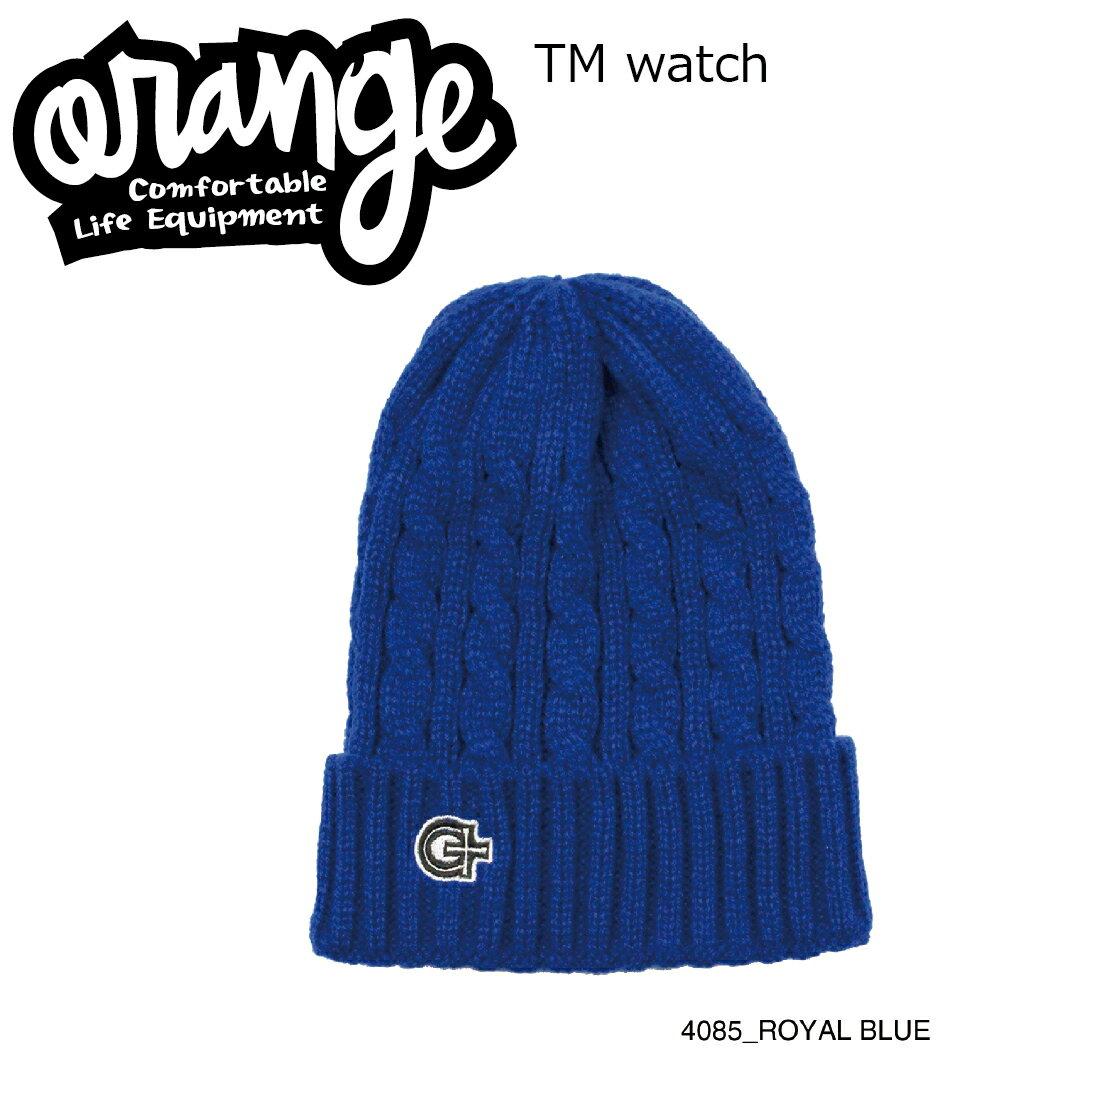 Oran'ge Tm Watch Cap Beanie 4085 ROYAL BLUE オレンジ ティーエム ワッチ キャップ ビーニー ニットキャップ 2つ折り